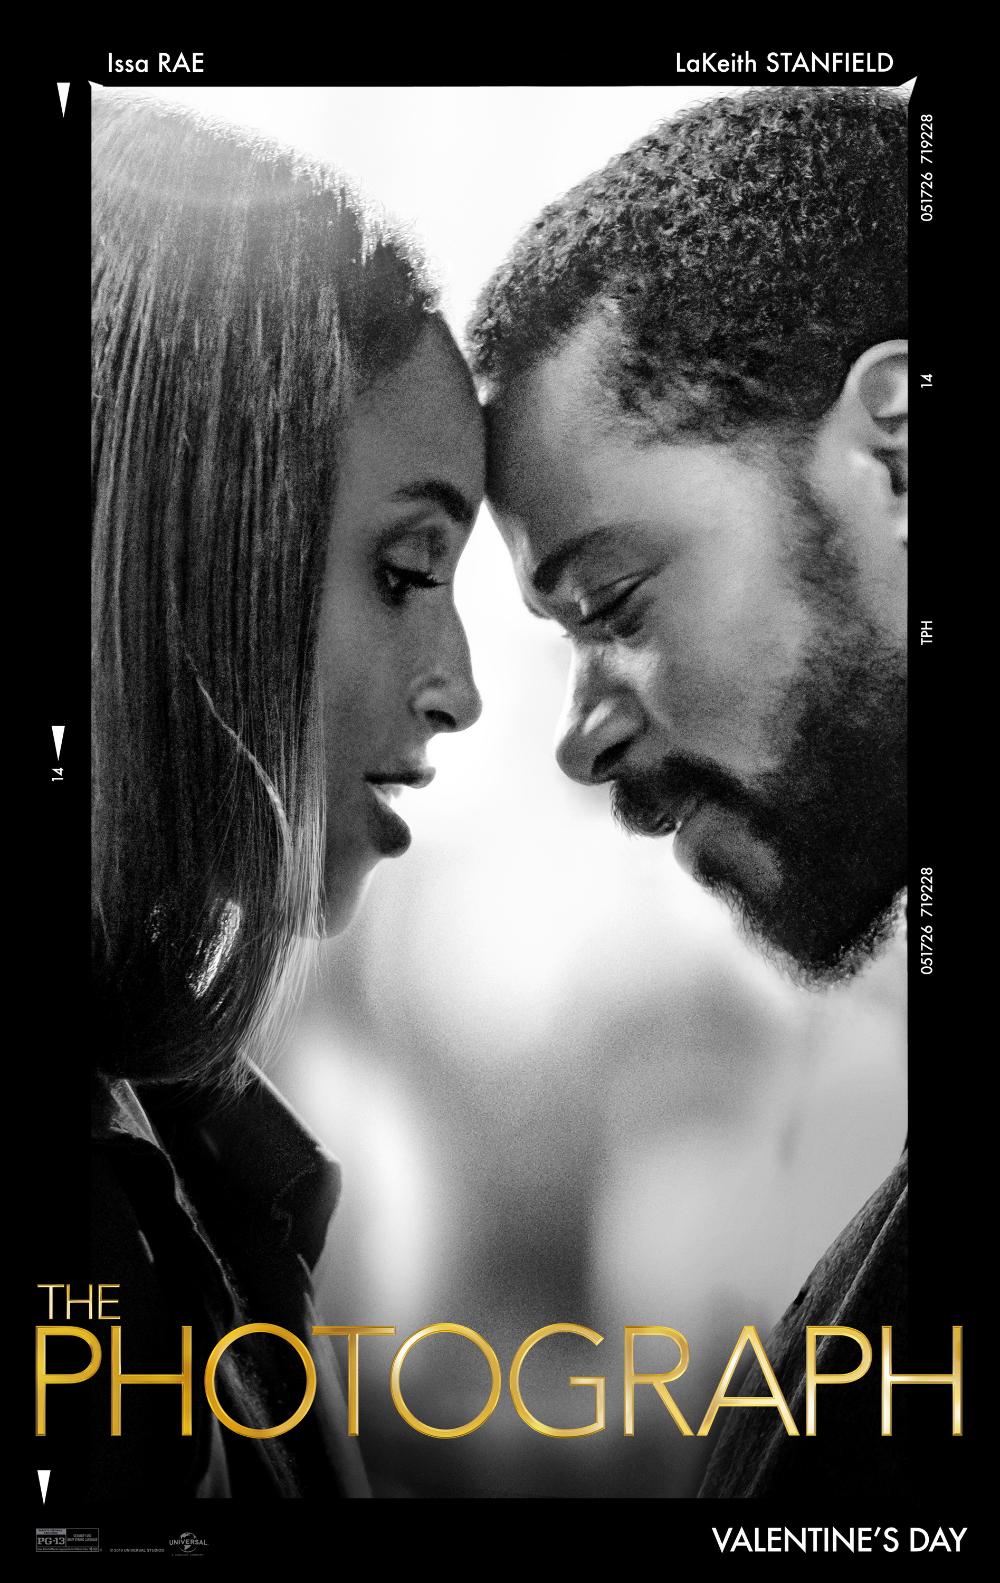 Poster Filma Fotografiya With Images Free Movies Online Full Movies Online Free Streaming Movies Free